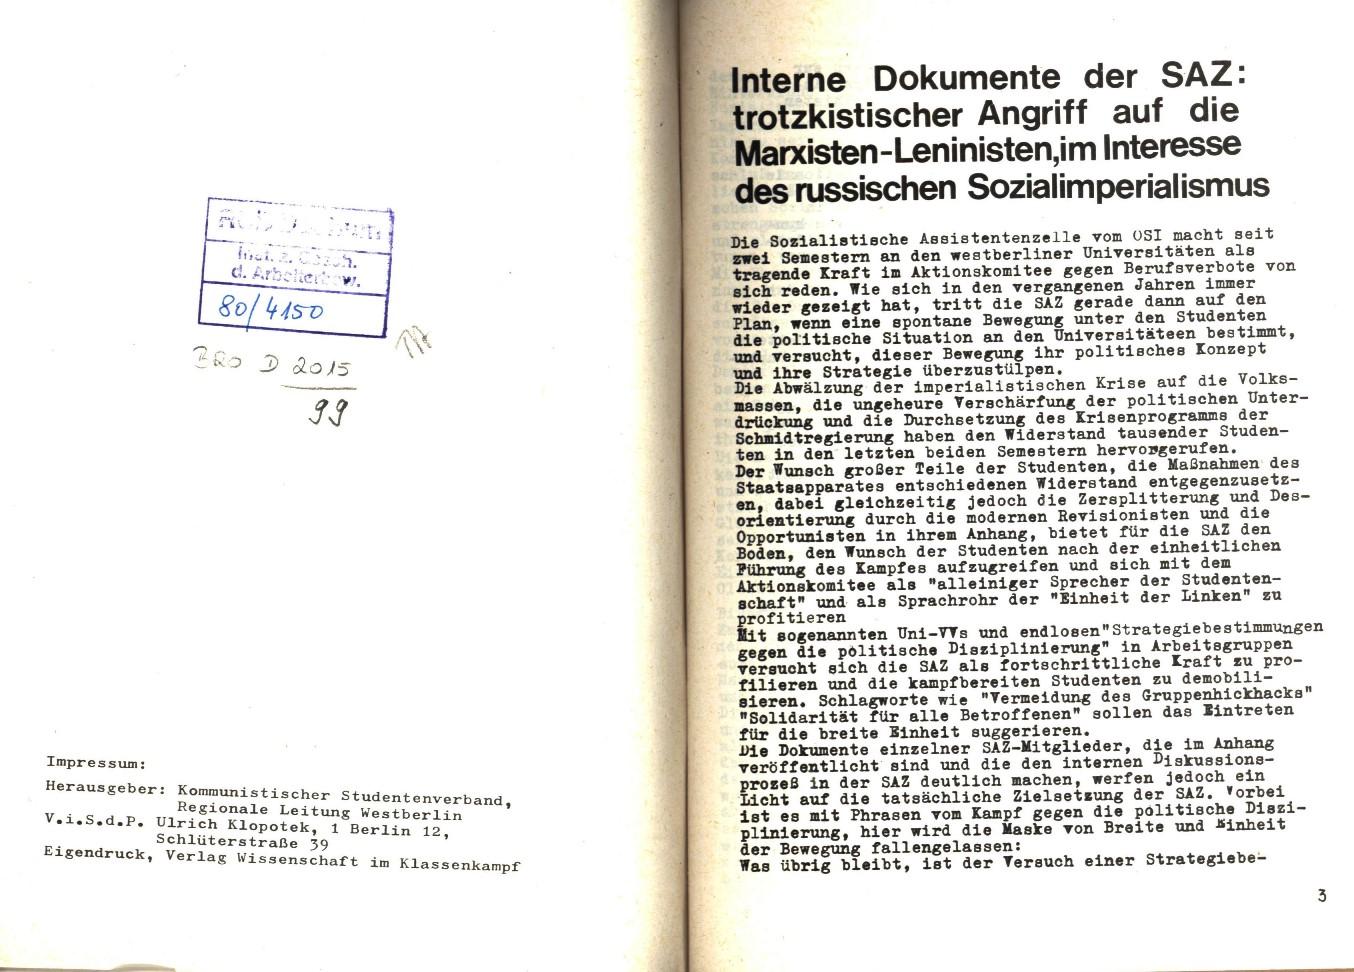 Berlin_KSV_1975_Dokumente_der_SAZ_03